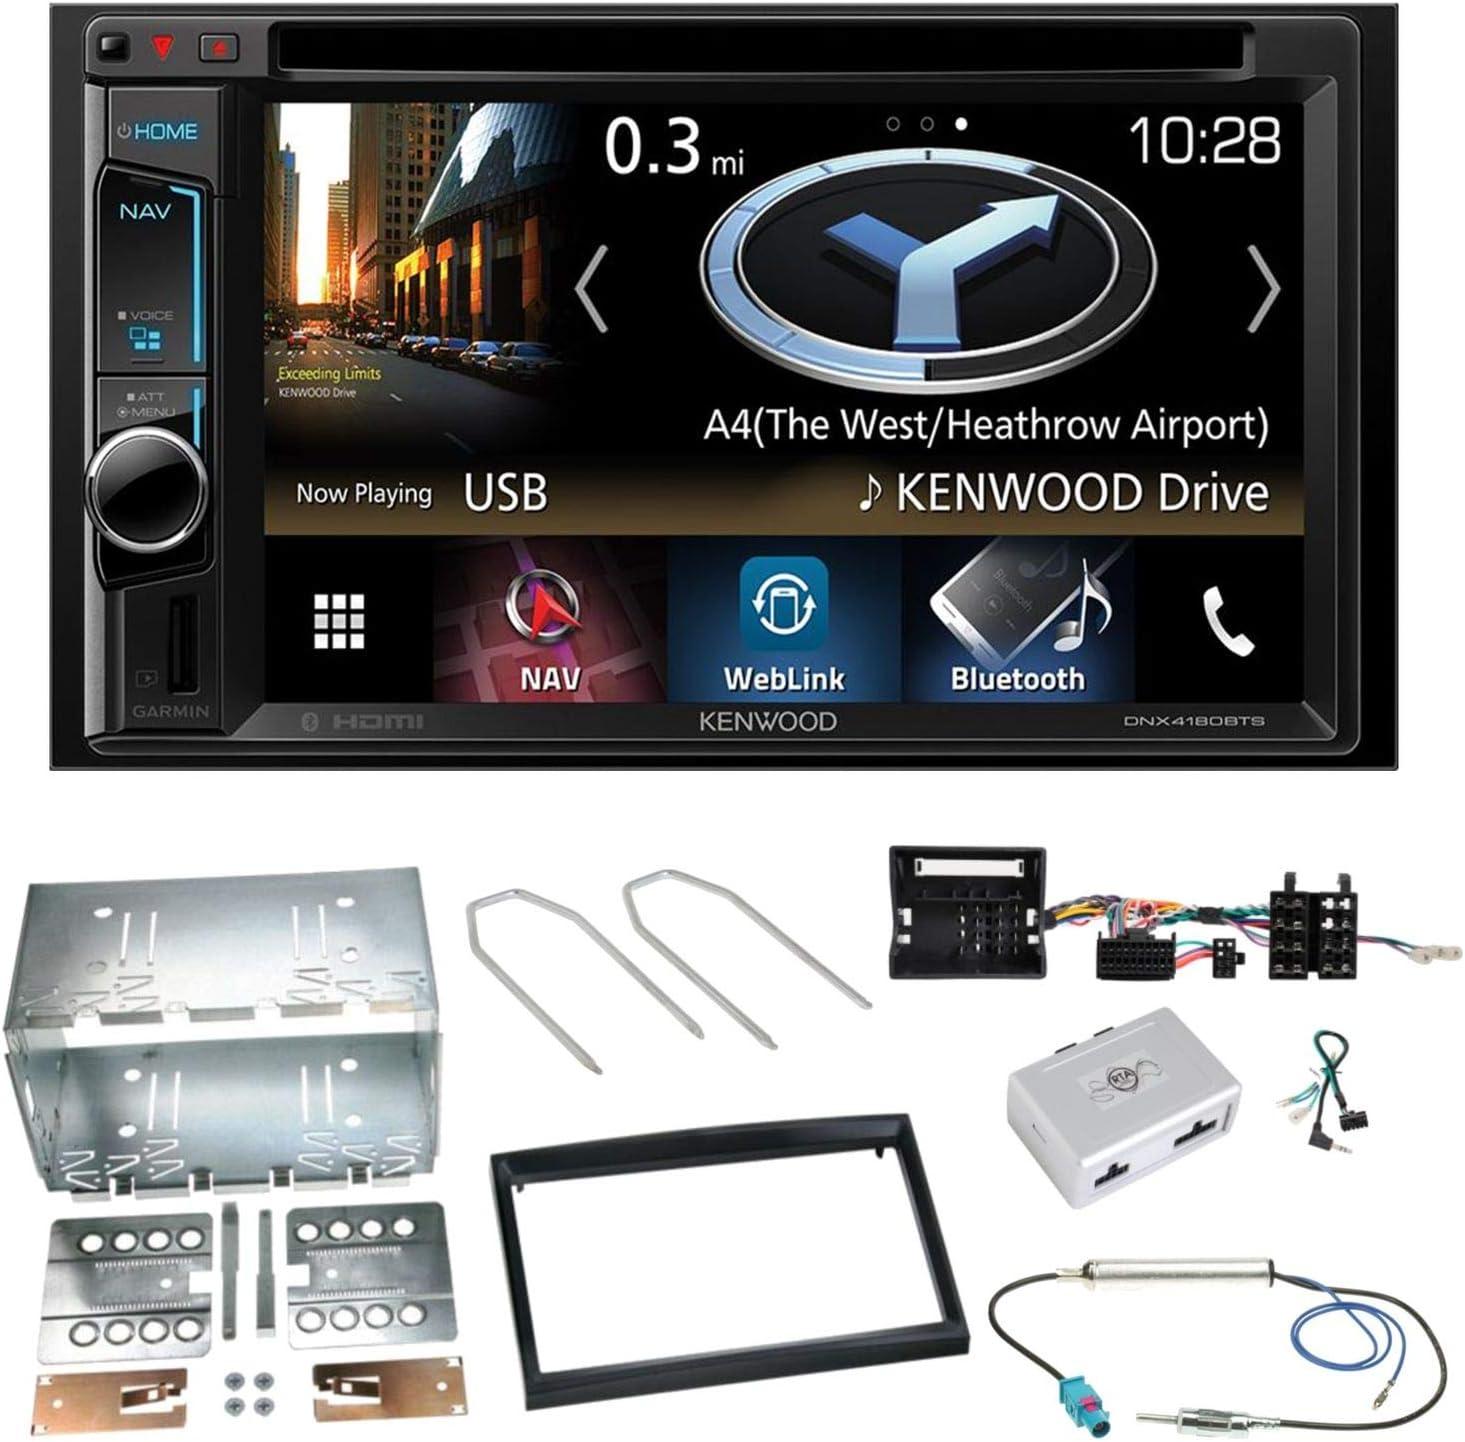 Kenwood Dnx 4180bts Navigation Naviceiver Bluetooth Carplay Usb Cd Dvd Autoradio Flac Doppel Din Einbauset Für Citroen C2 C3 Berlingo Jumpy